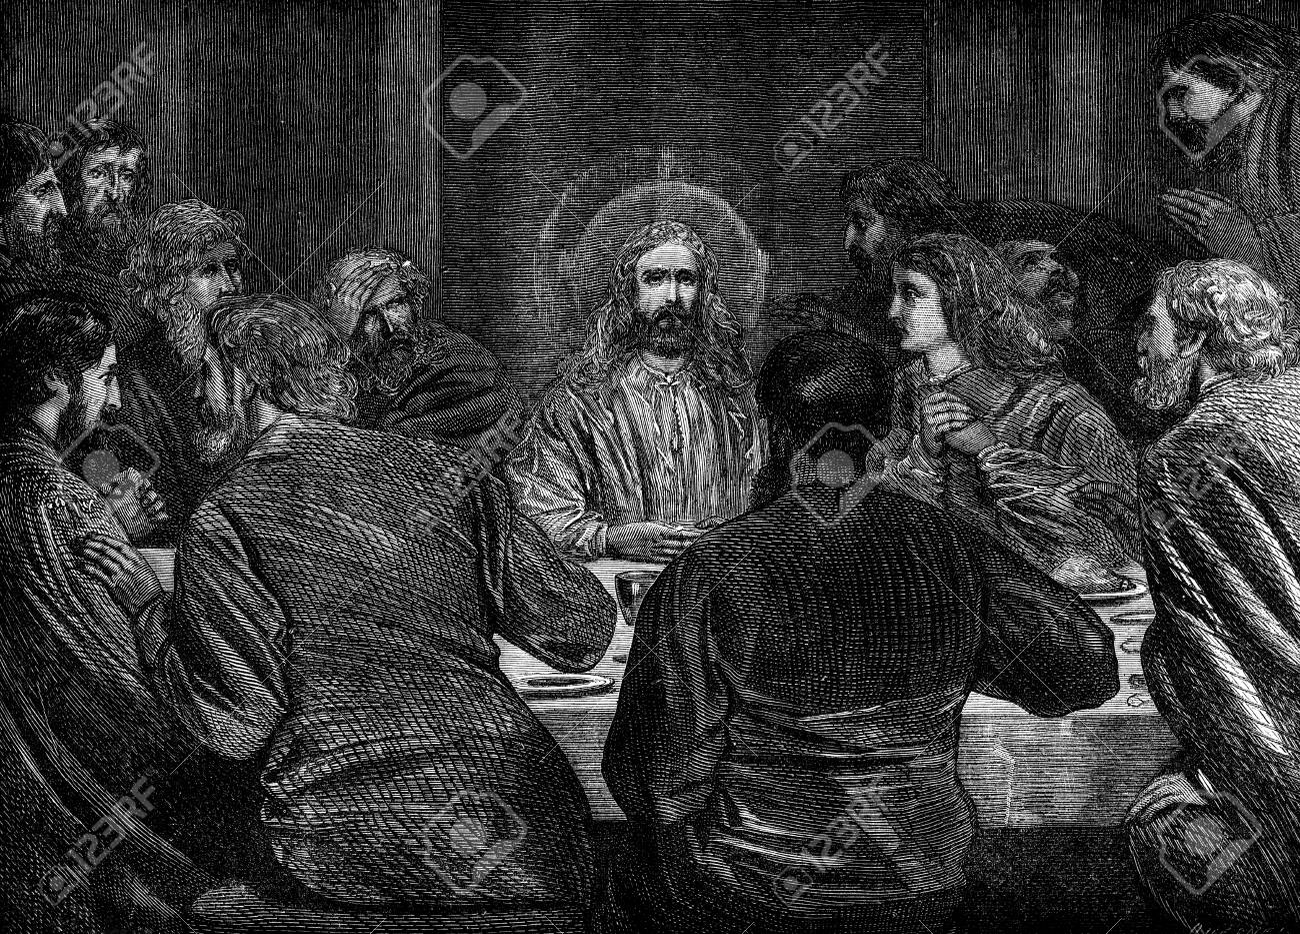 an engraved vintage illustration image of jesus at the last supper